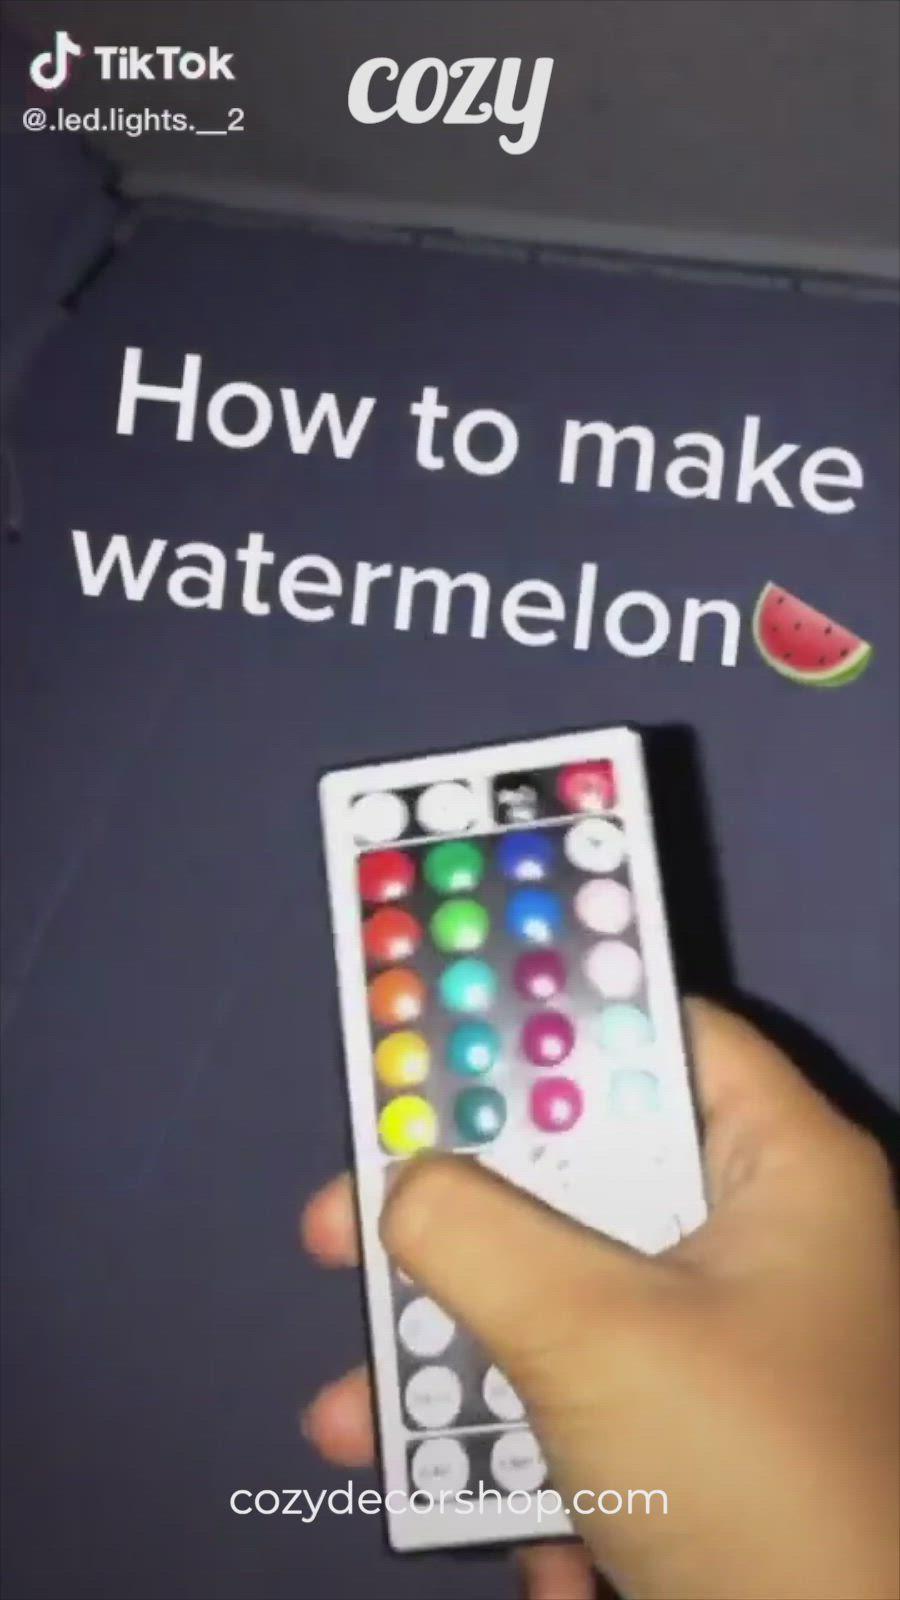 How To Make Watermelon Tiktok Led Lights Video Led Lighting Diy Led Room Lighting Led Light Strips Diy